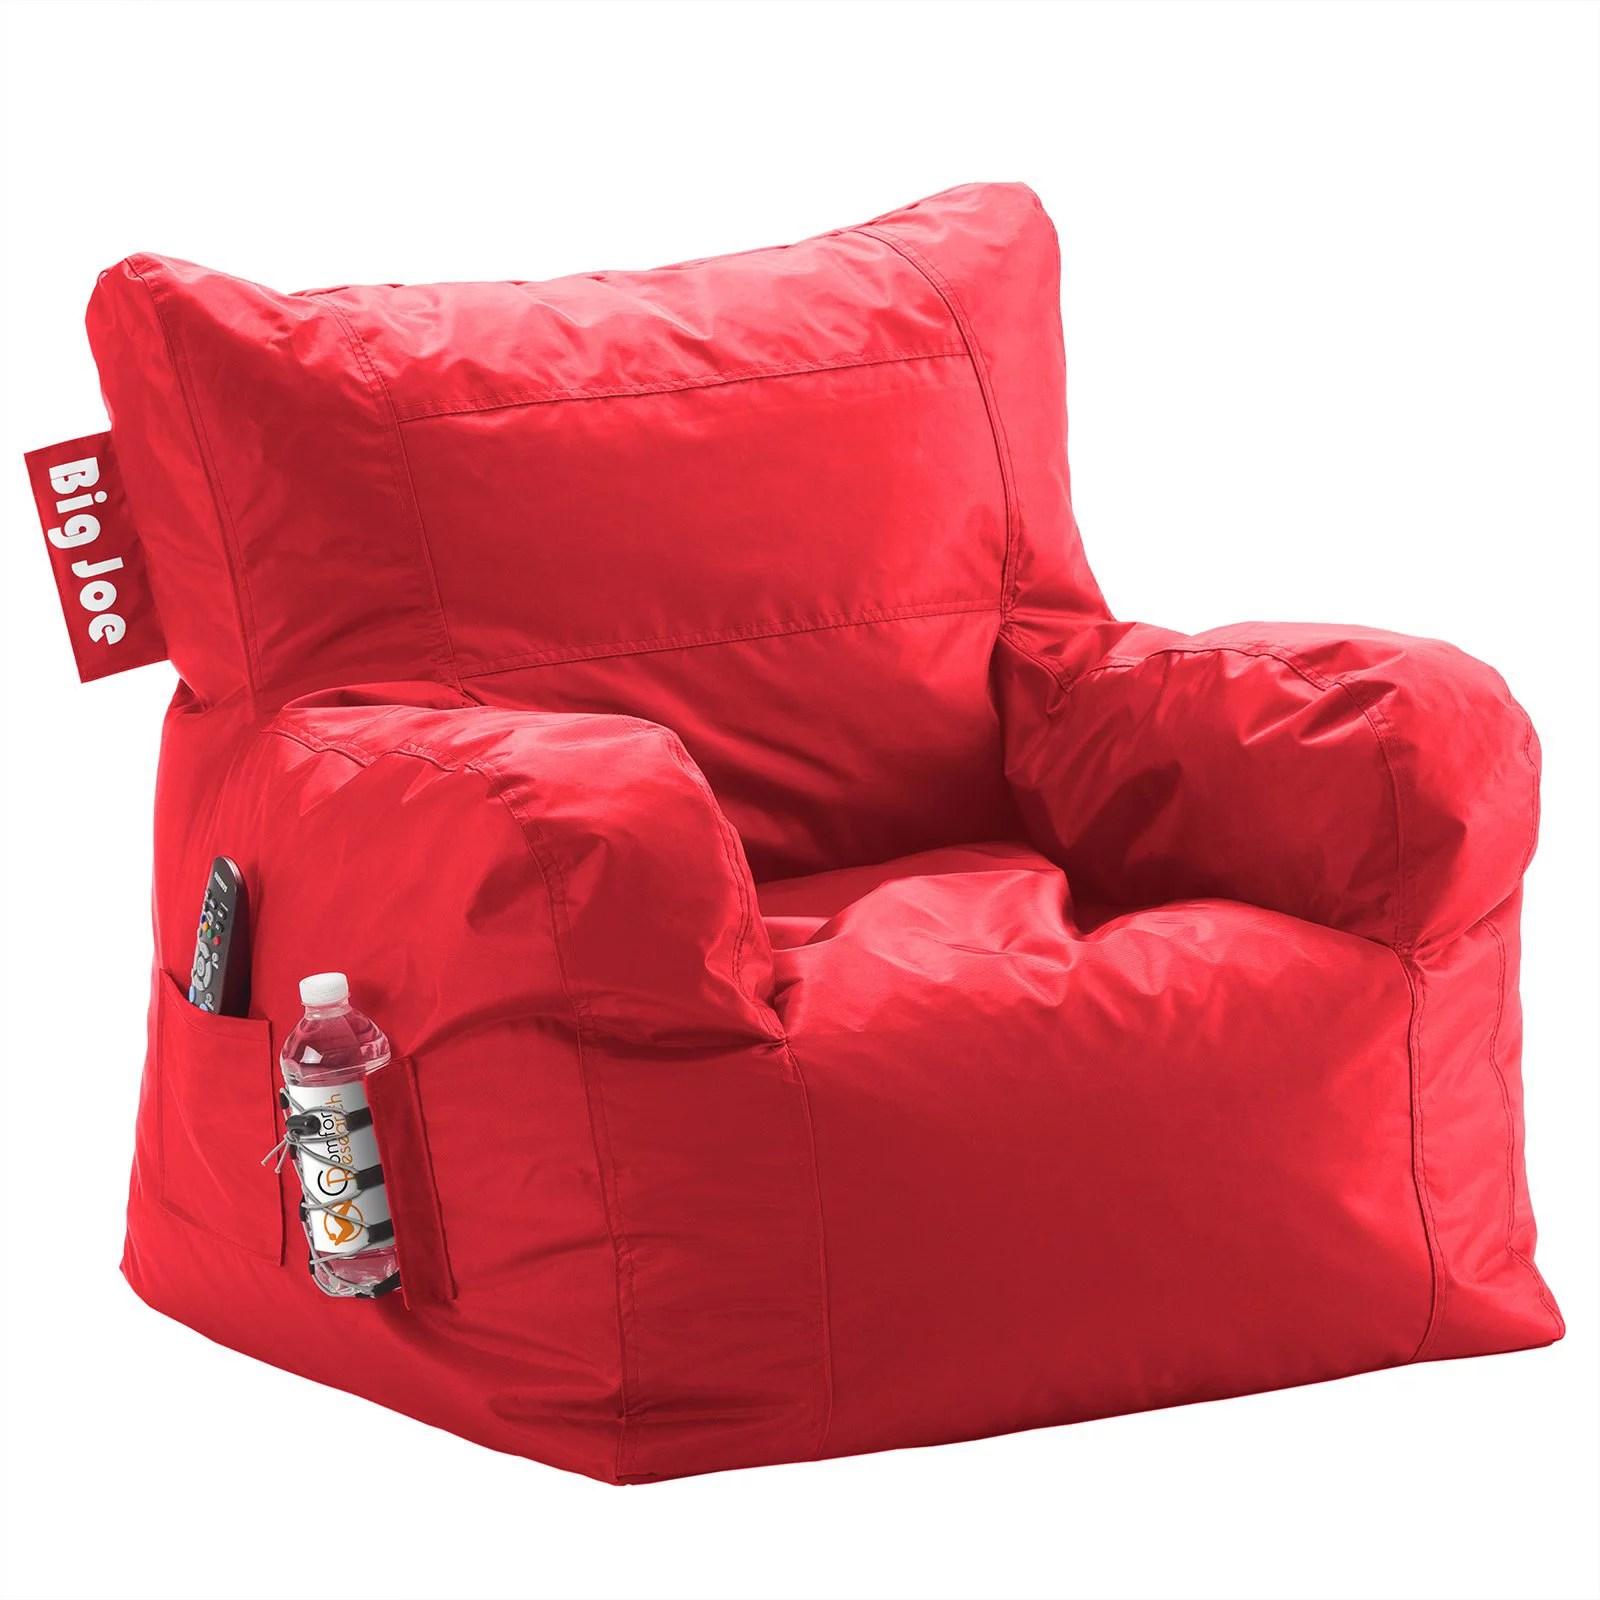 big joe bean bag chair small unusual chairs multiple colors 33 x 32 25 walmart com